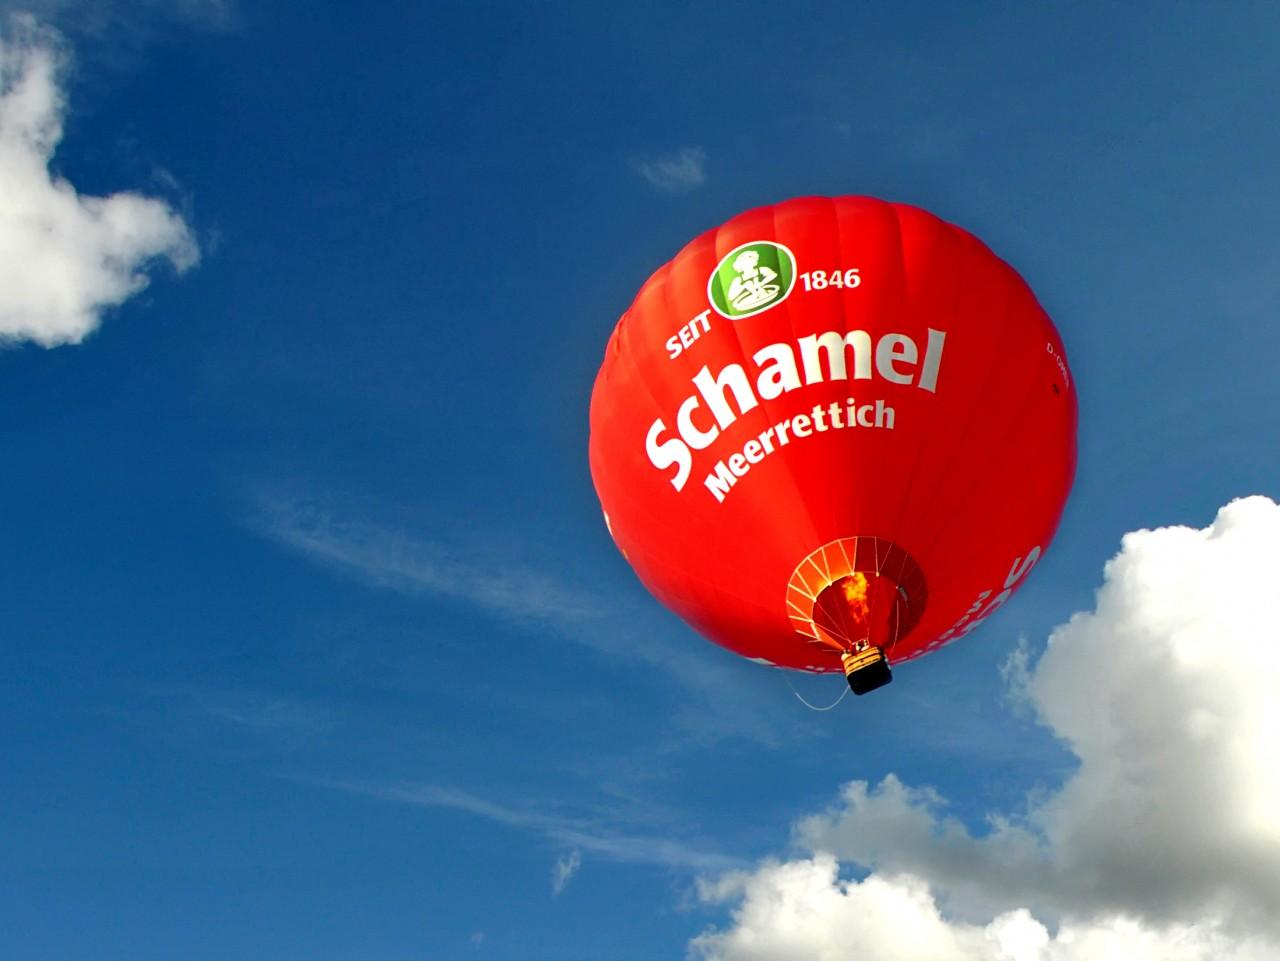 Schamel Meerrettich Heißluftballon